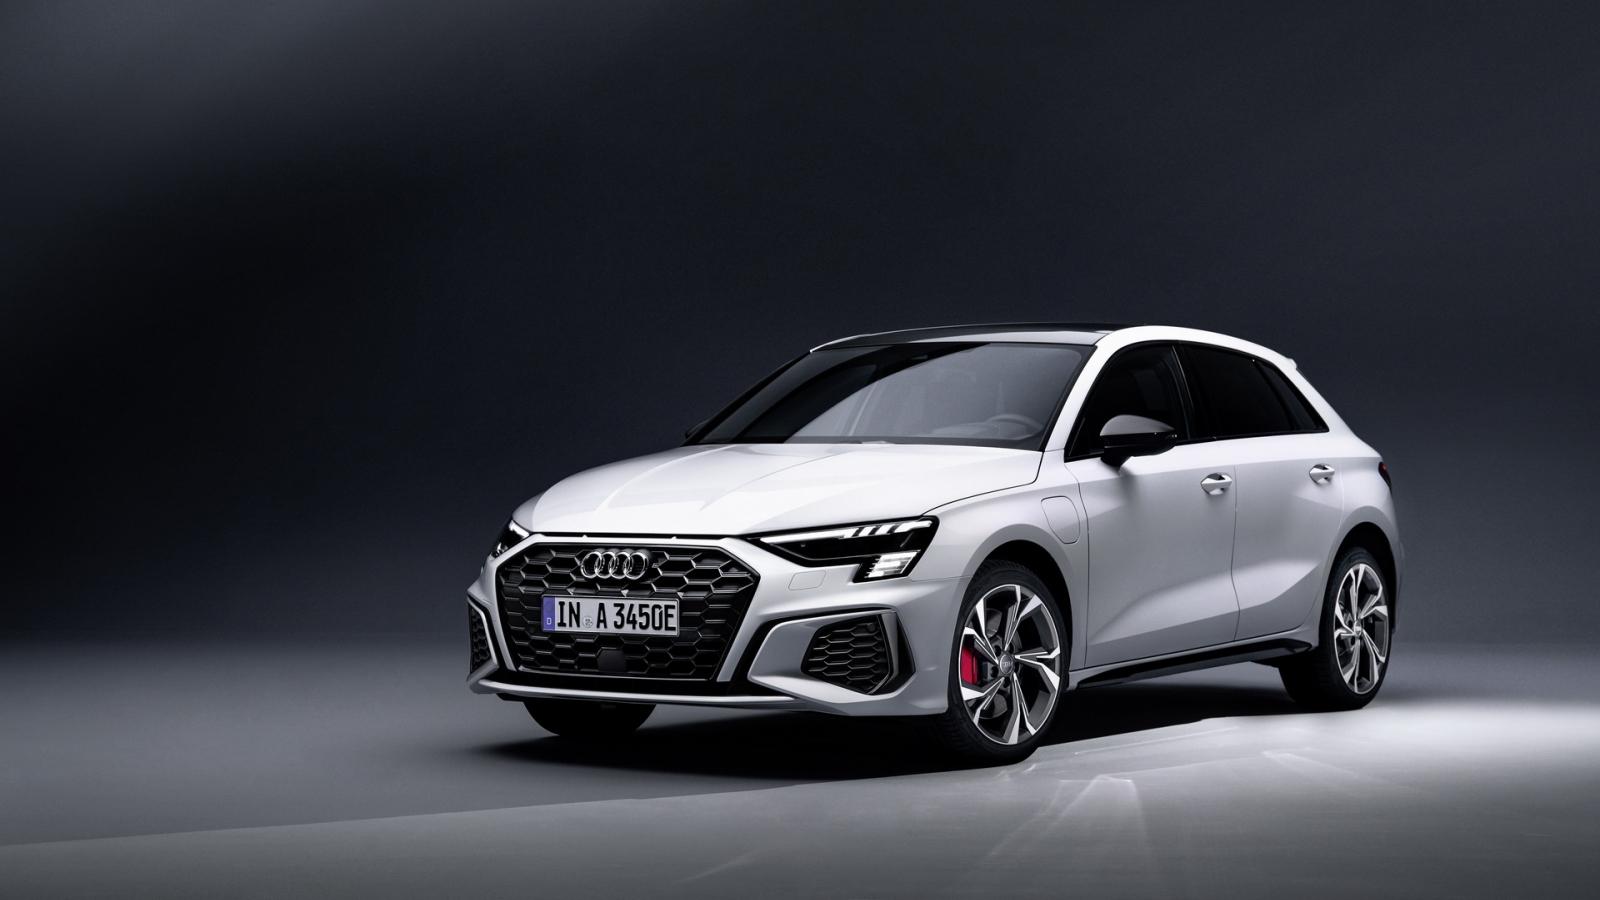 Audi A3 Sportback 45 TFSI e hybrid chính thức ra mắt